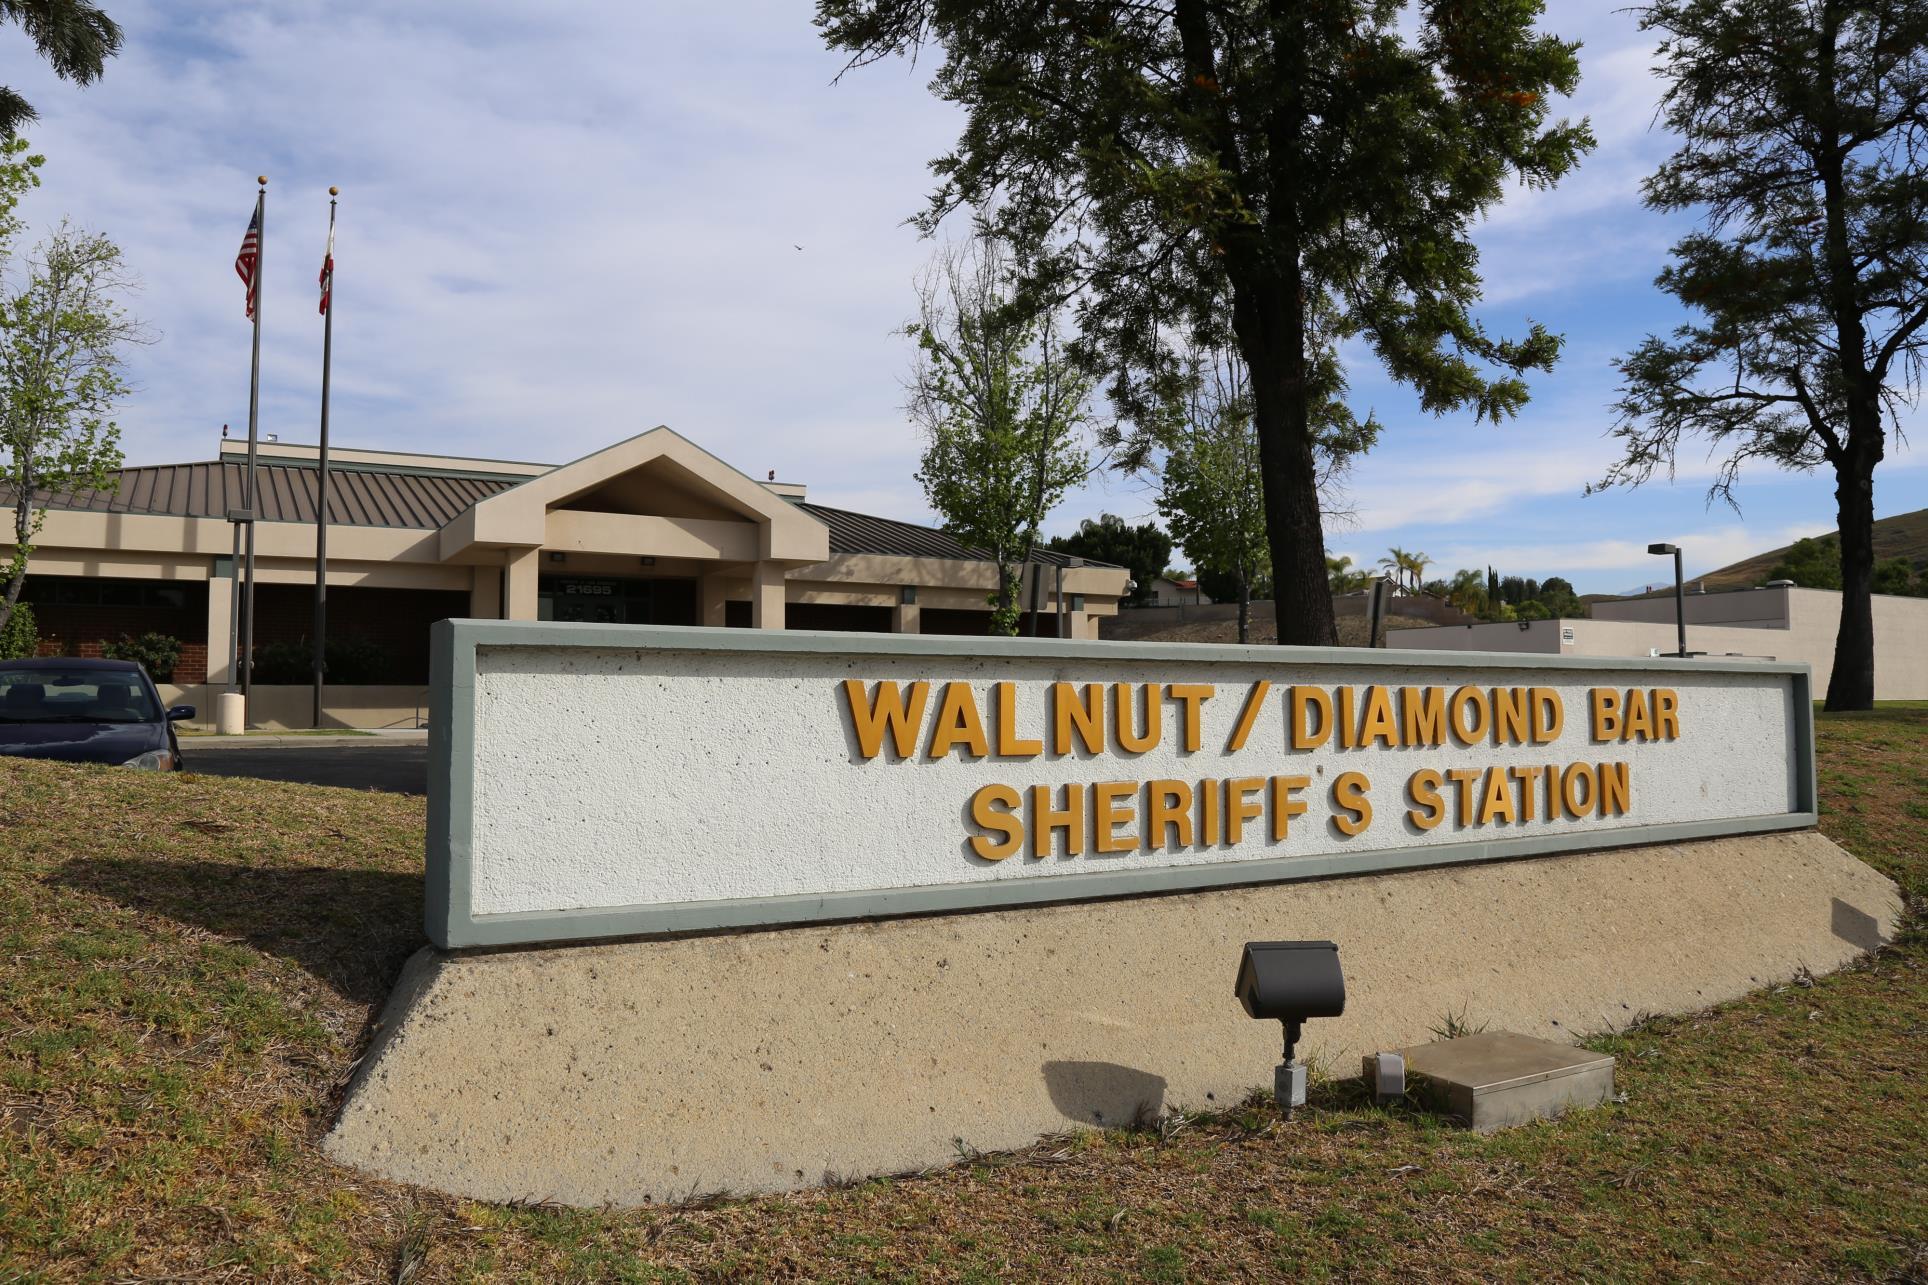 Sheriff's Department | City of Walnut, CA